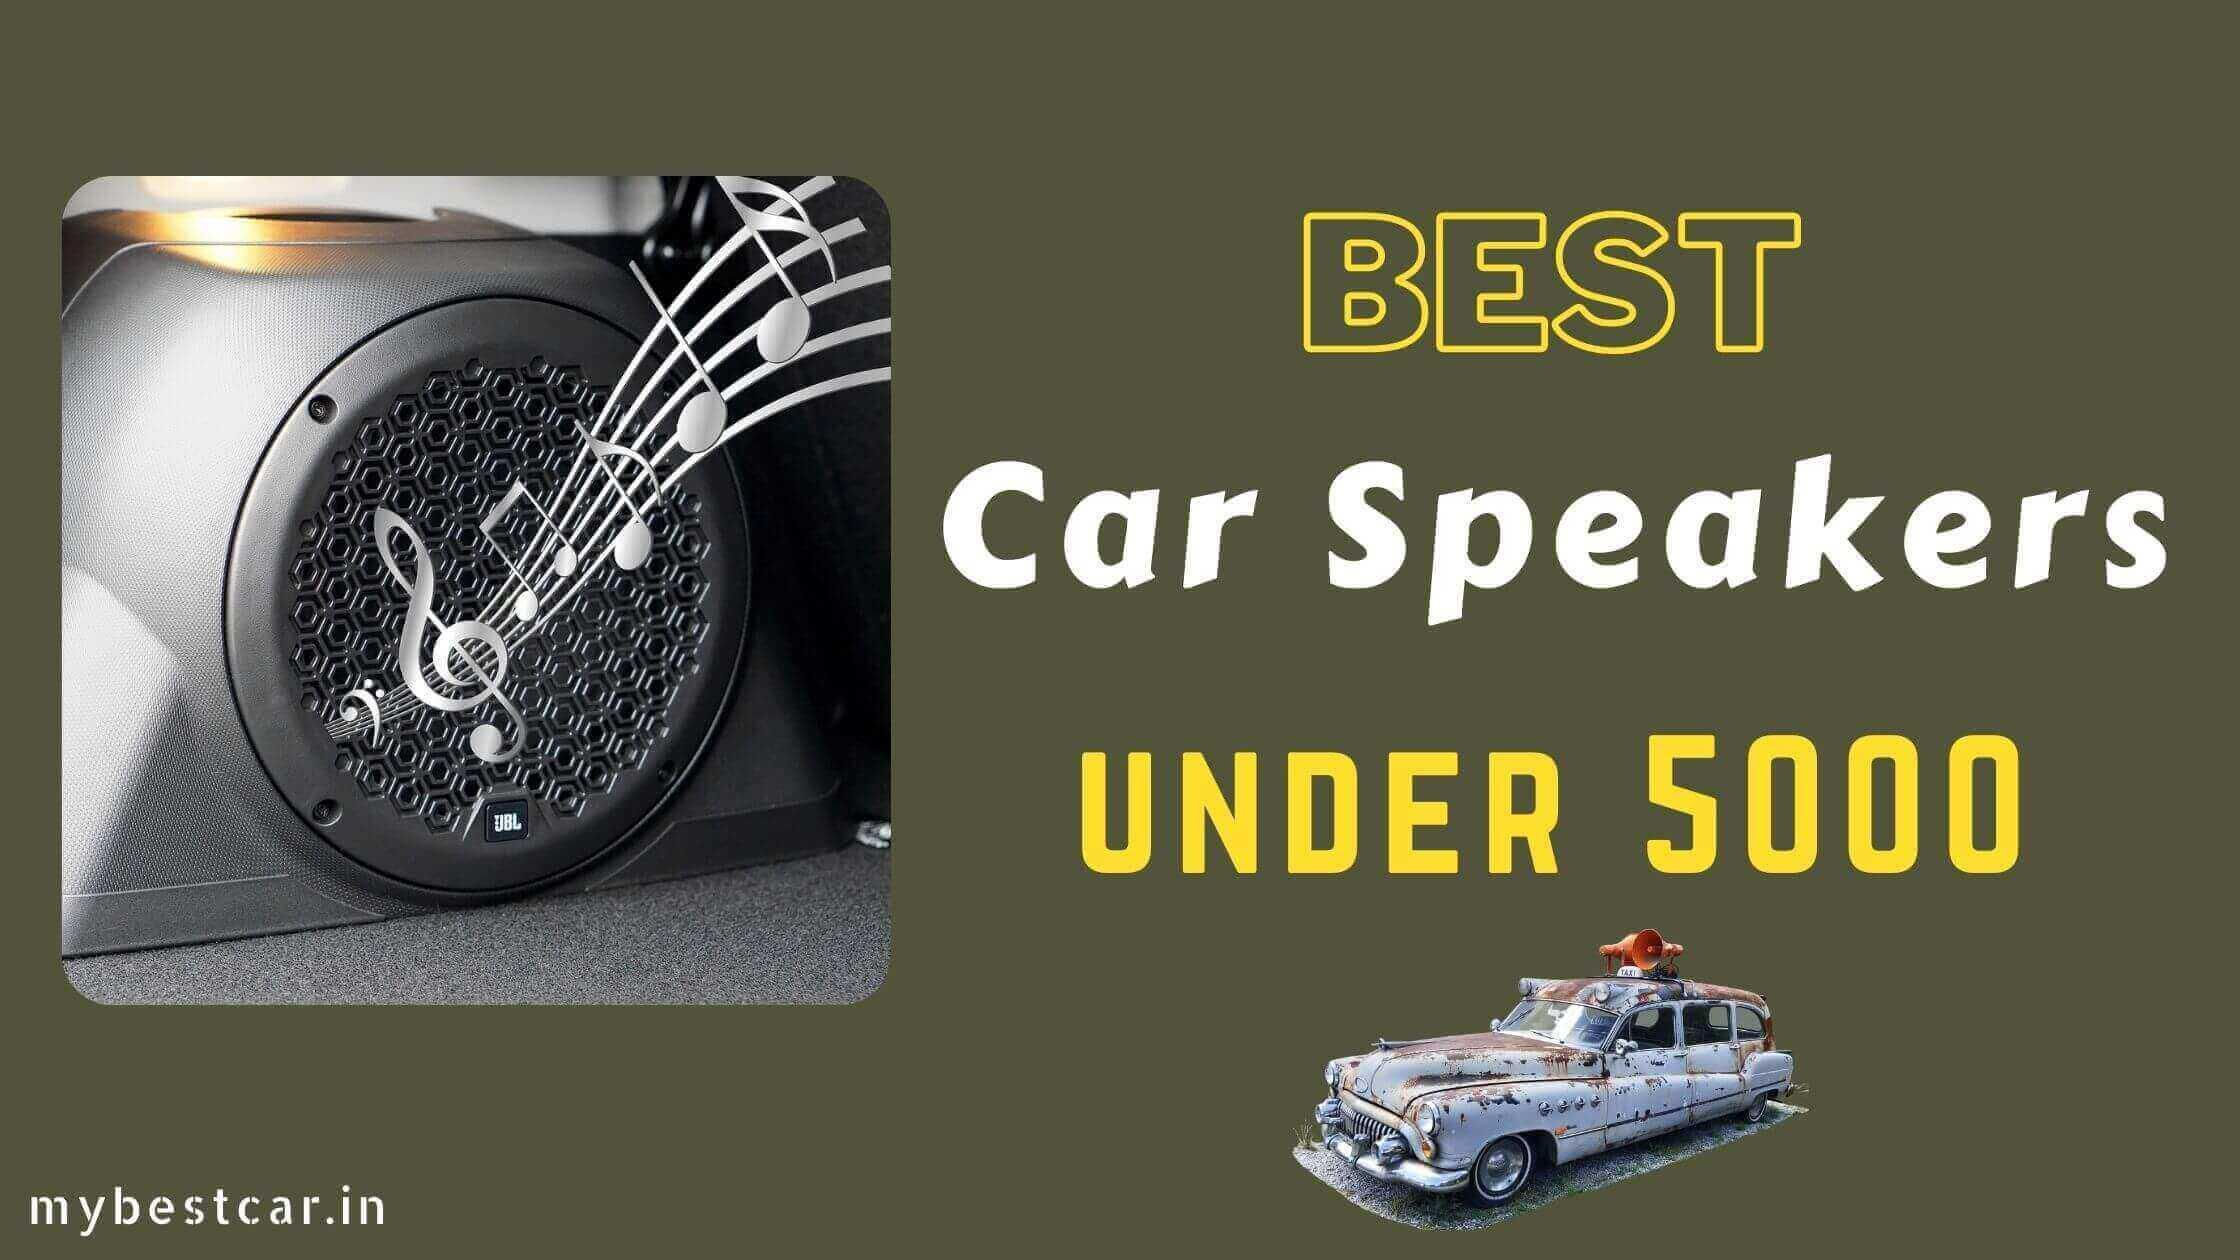 Best Car Speakers under 5000